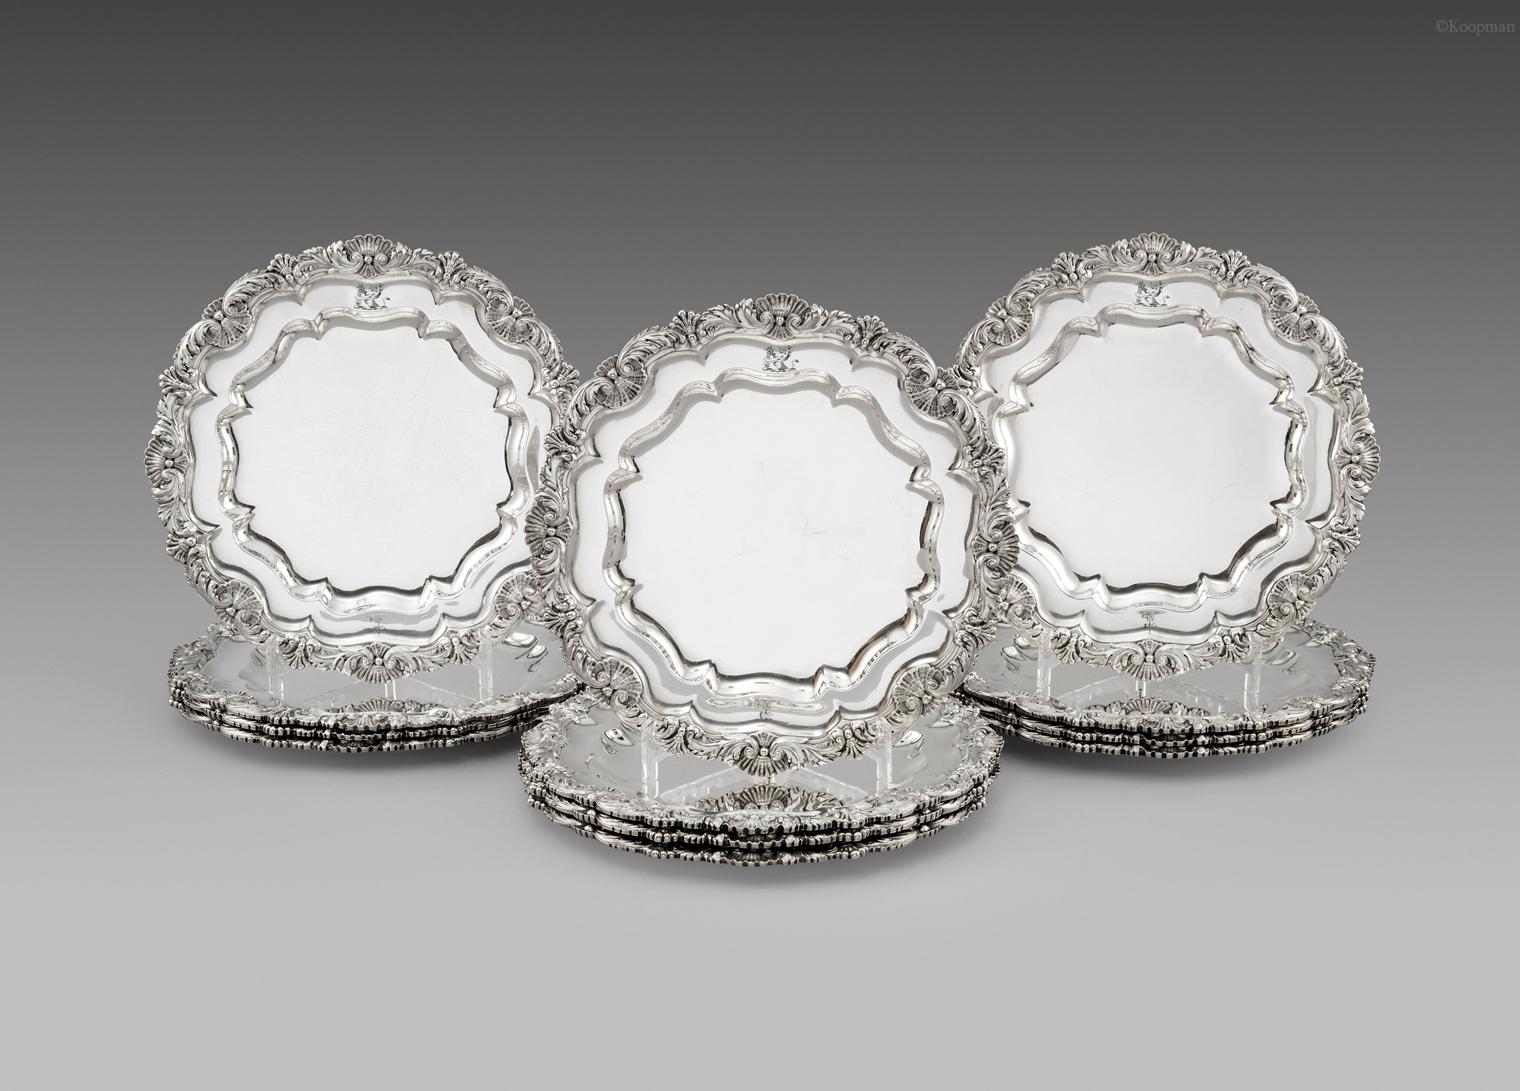 A Set of 12 George III Dinner Plates